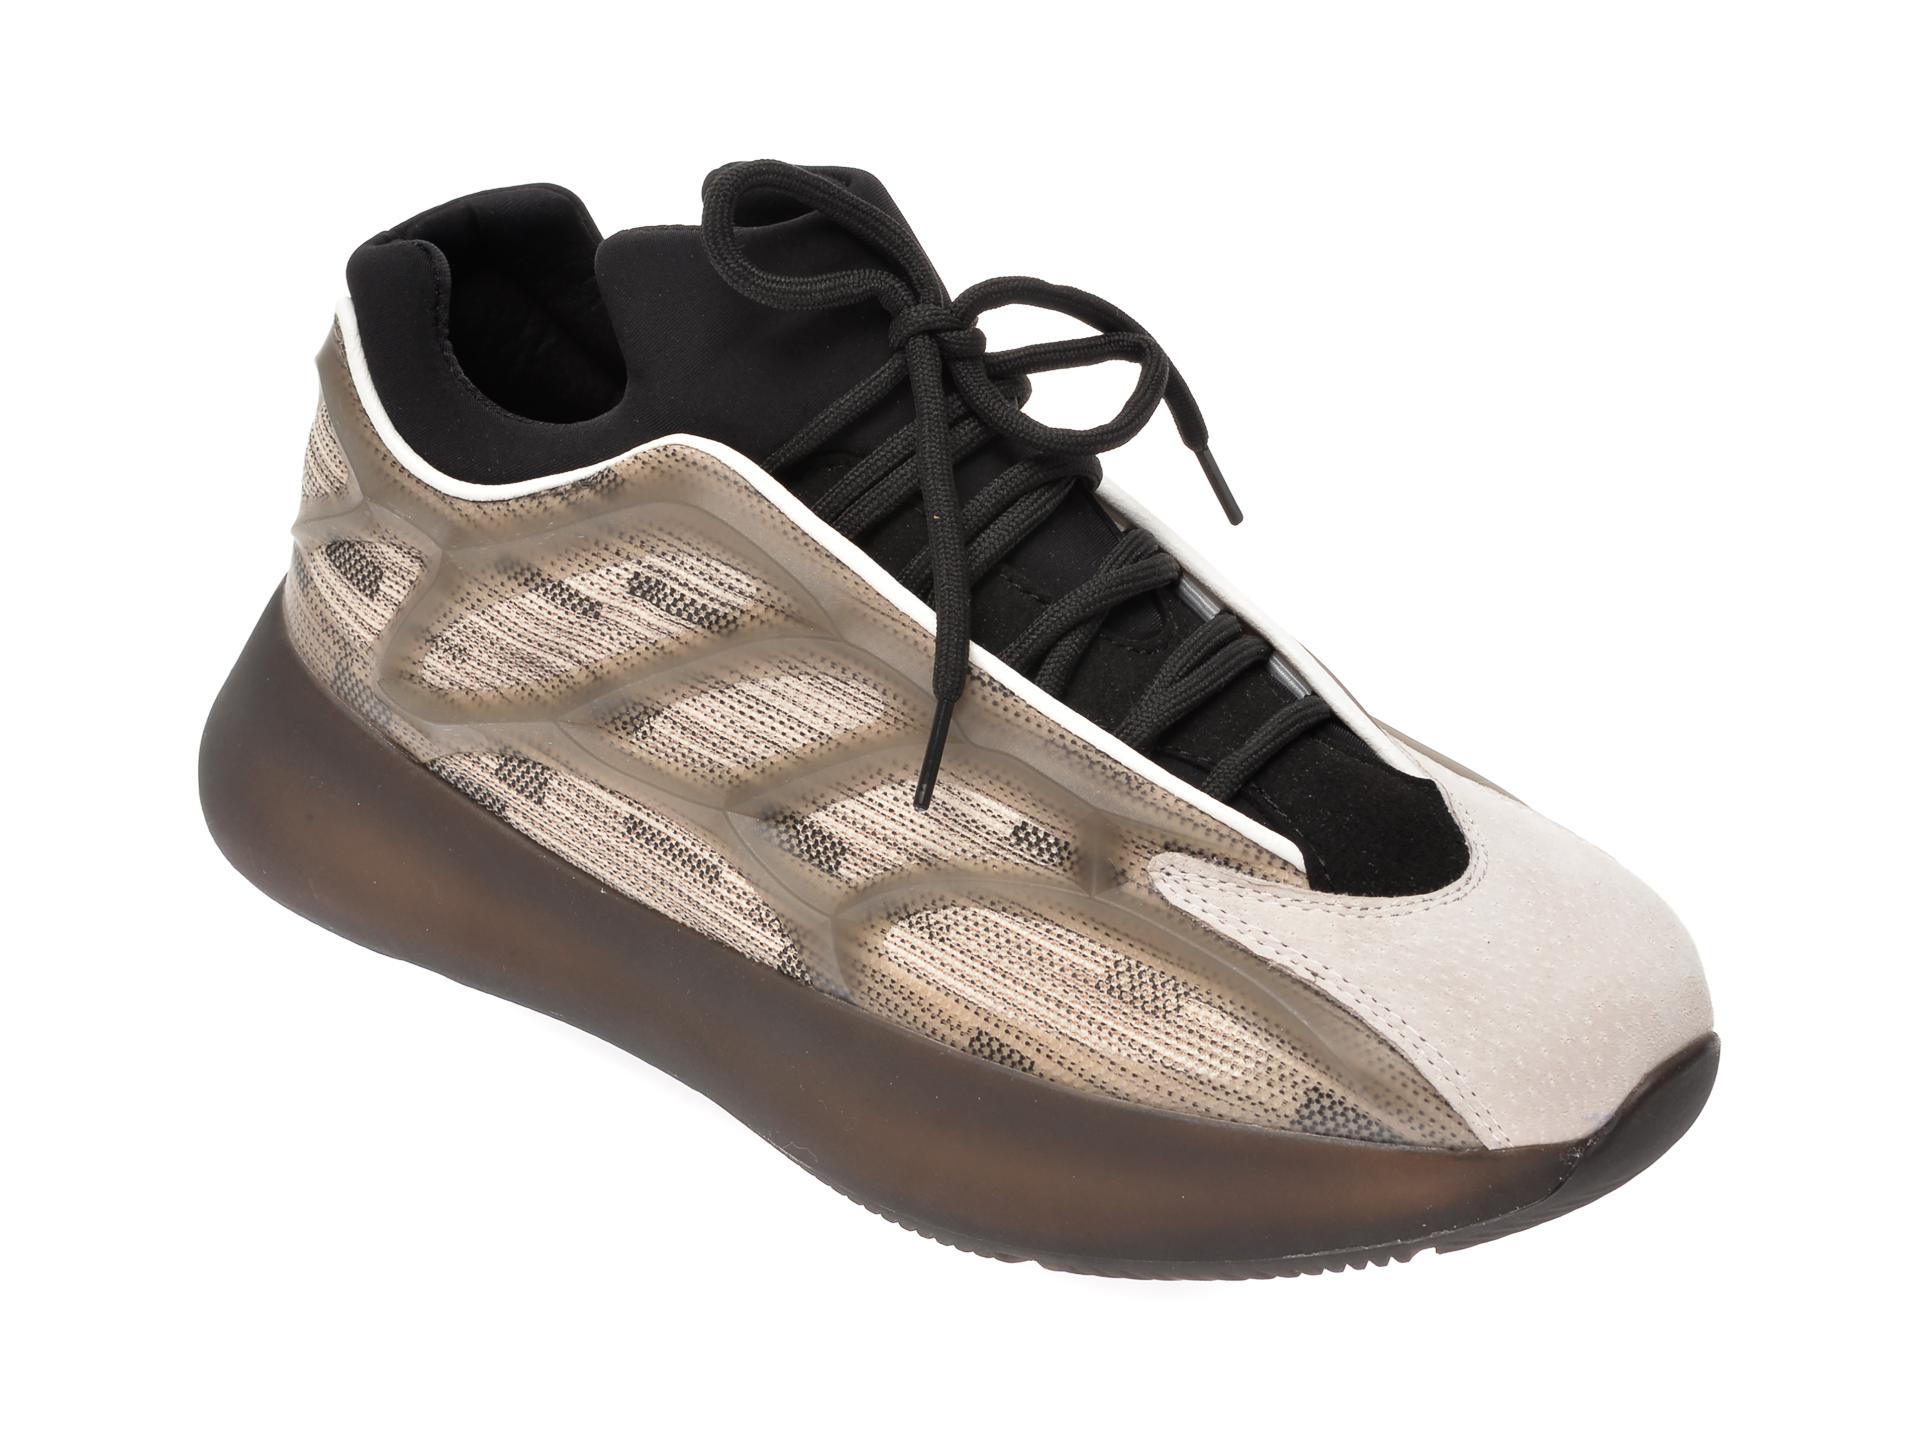 Pantofi sport BITE THE BULLET gri, 1010, din material textil si piele naturala imagine